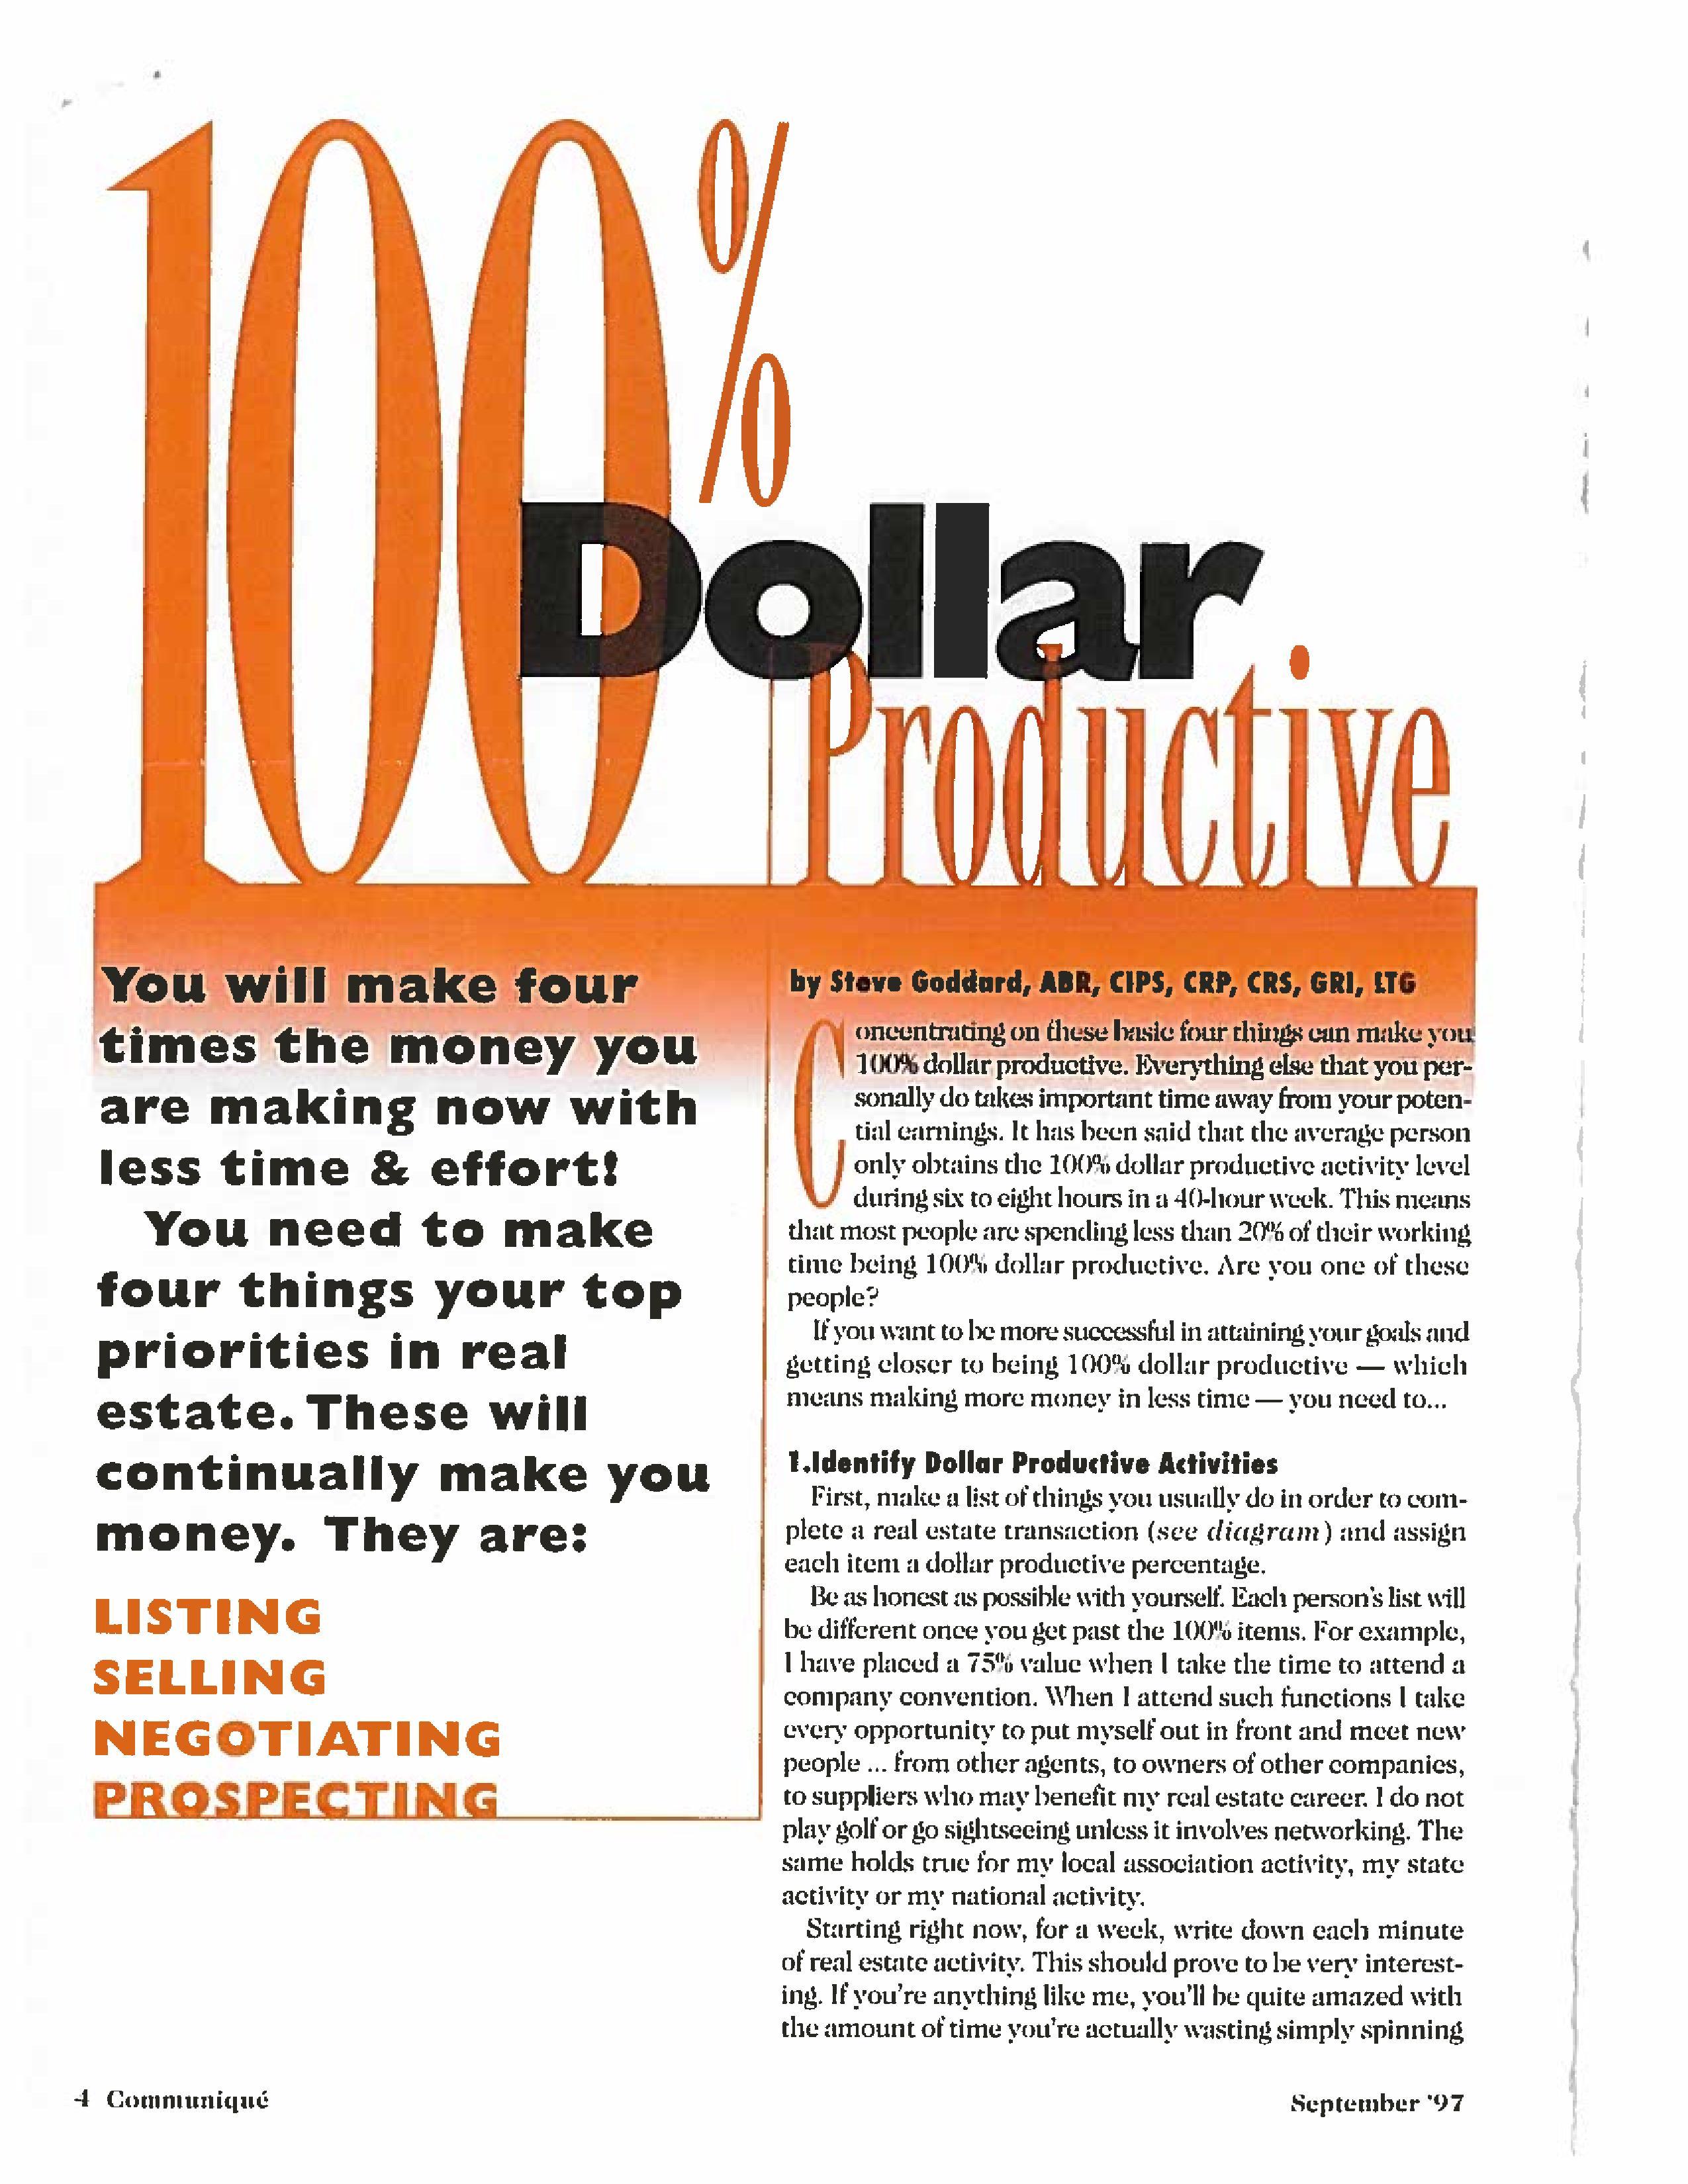 100PercentDollarP1.jpg